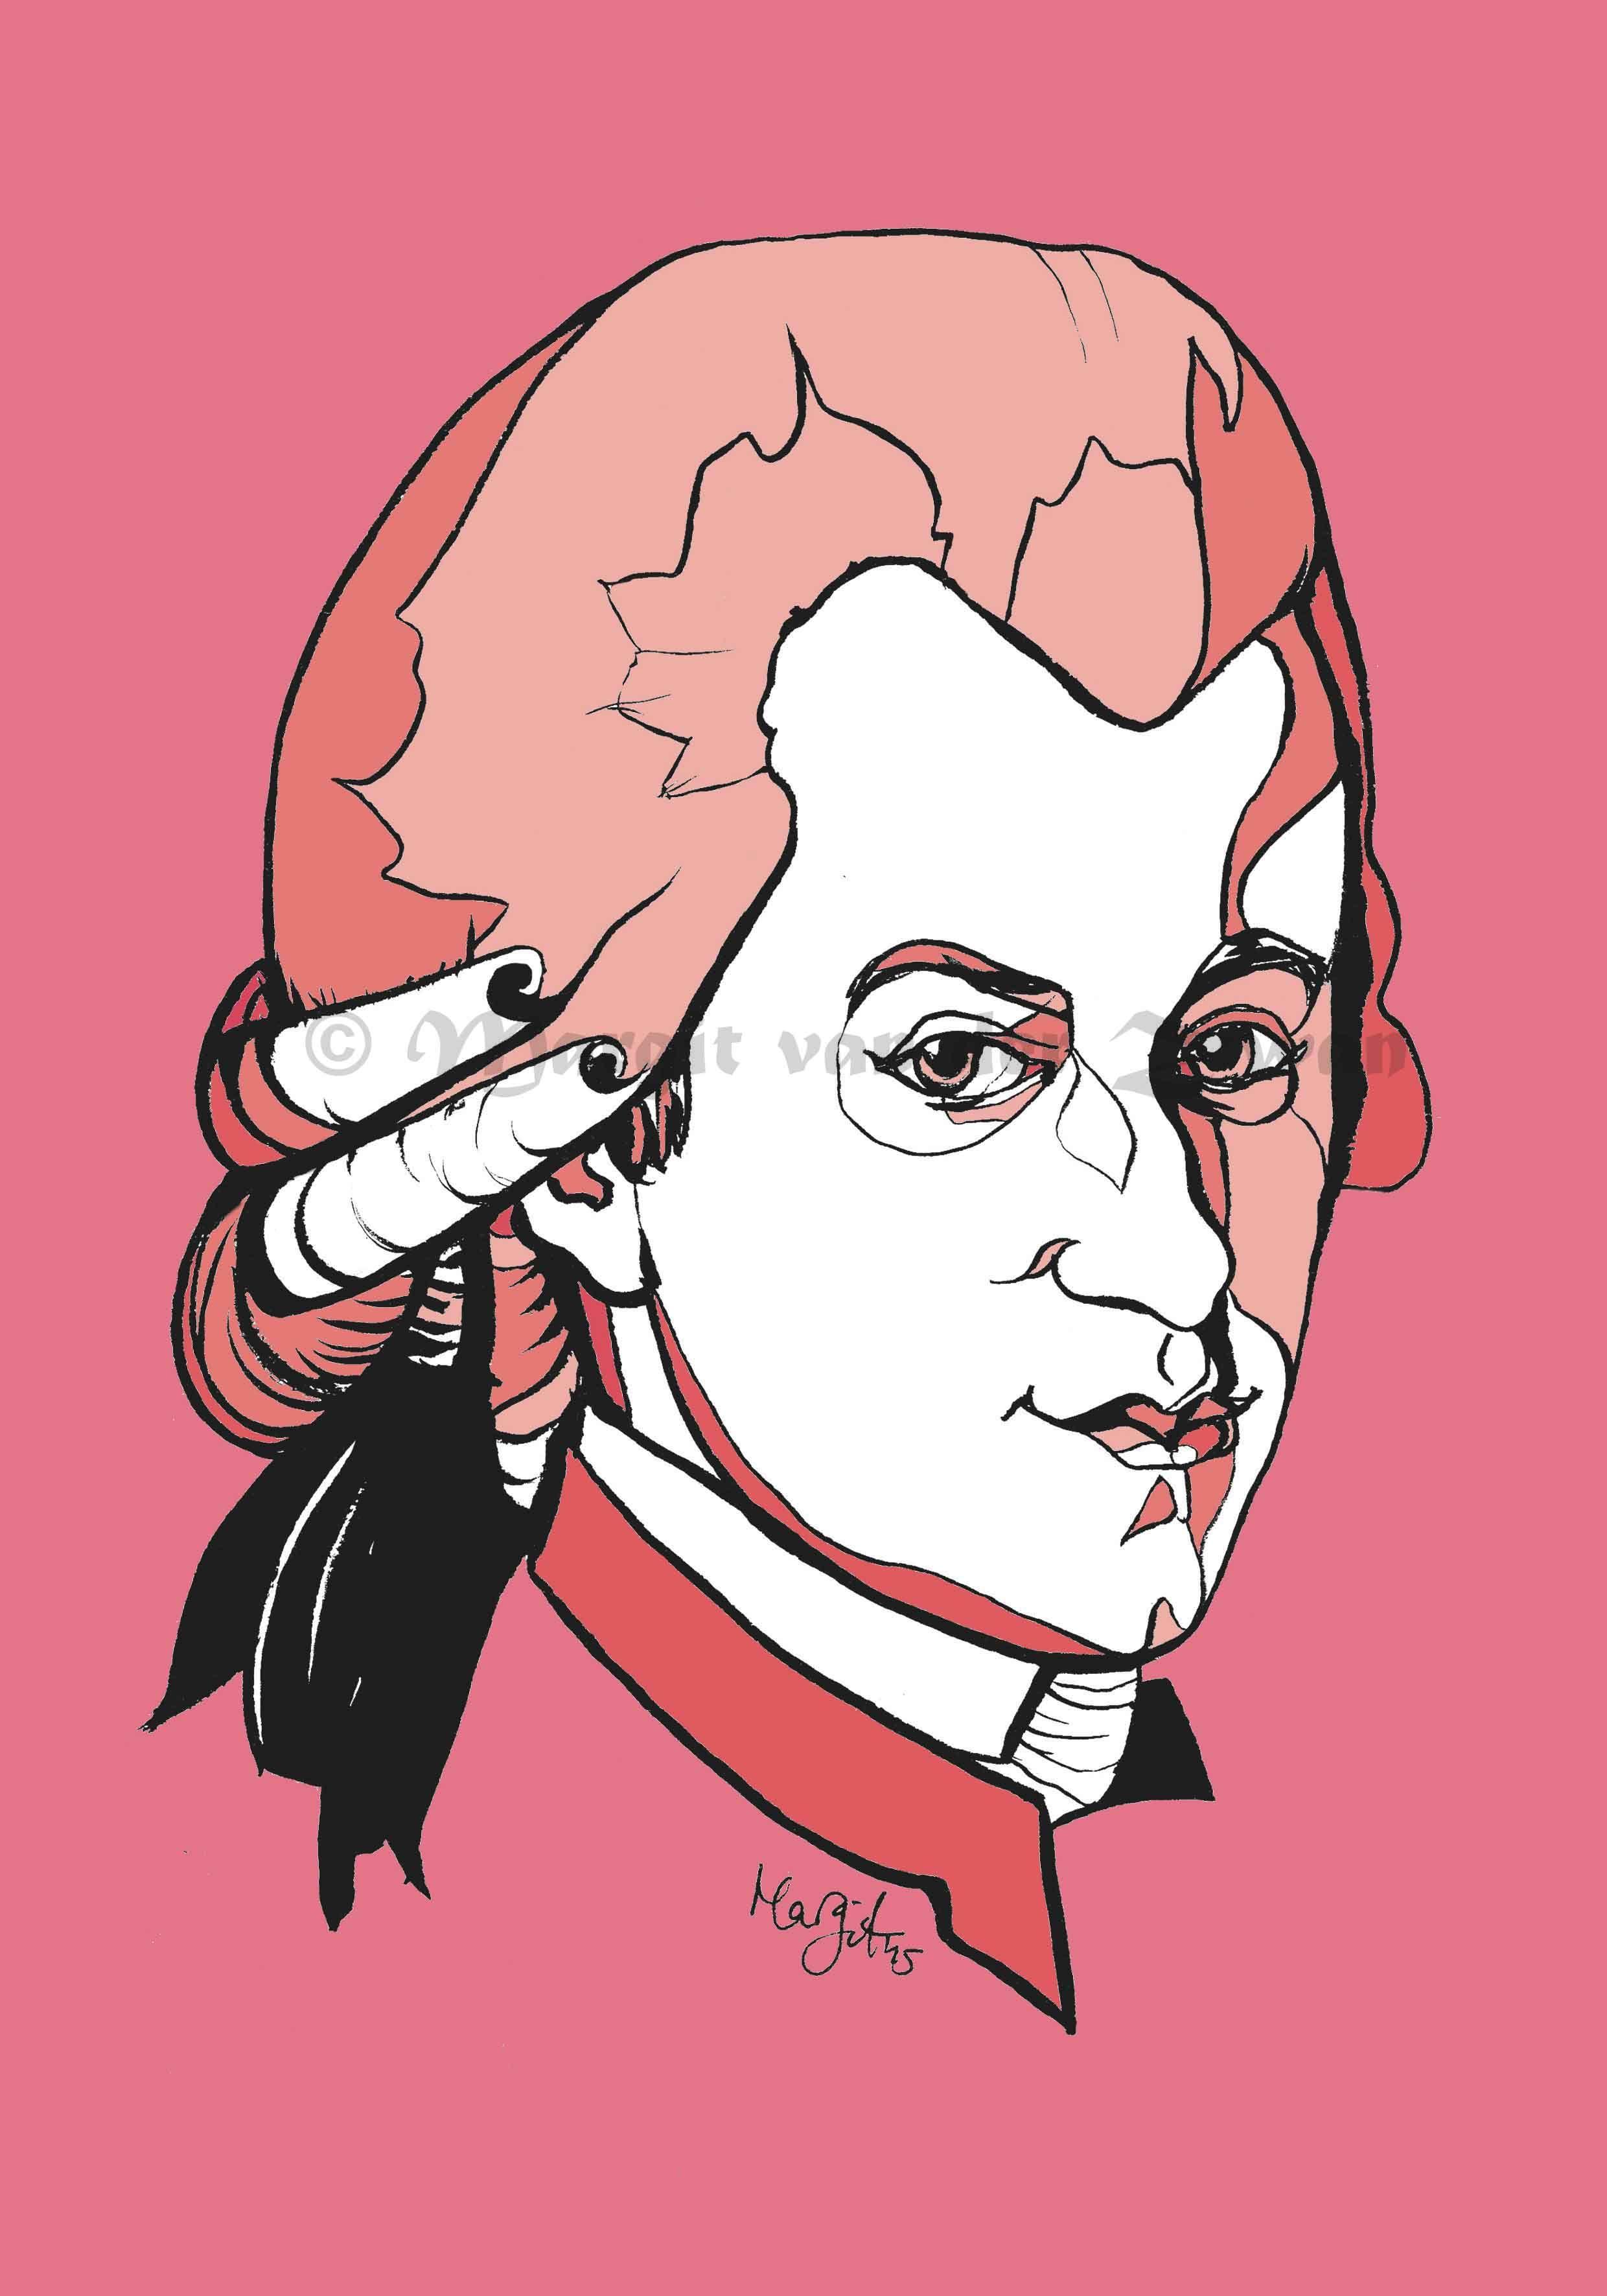 Mozart Art Print /'Hope/' Music Composing Wolfgang Amadeus Photo Poster Gift